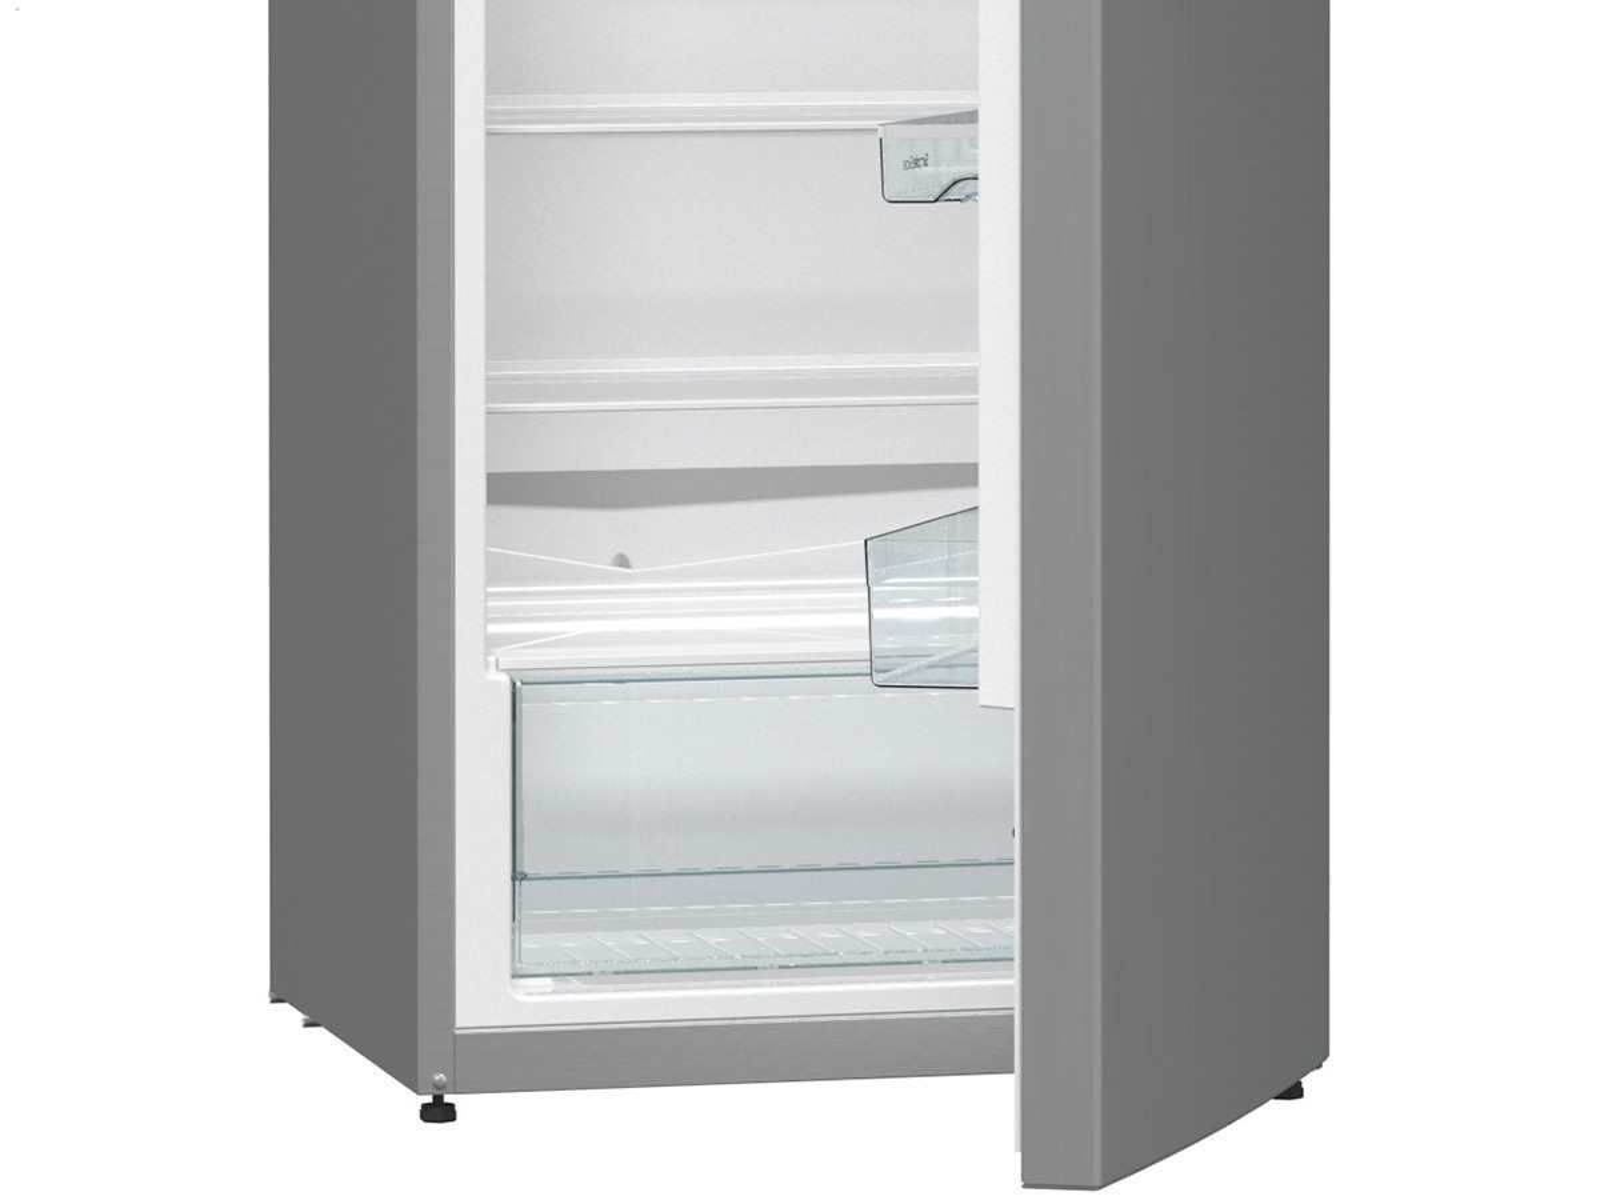 Side By Side Kühlschrank Dunkelgrau : Gorenje rb 6153 bx standkühlschrank grau metallic